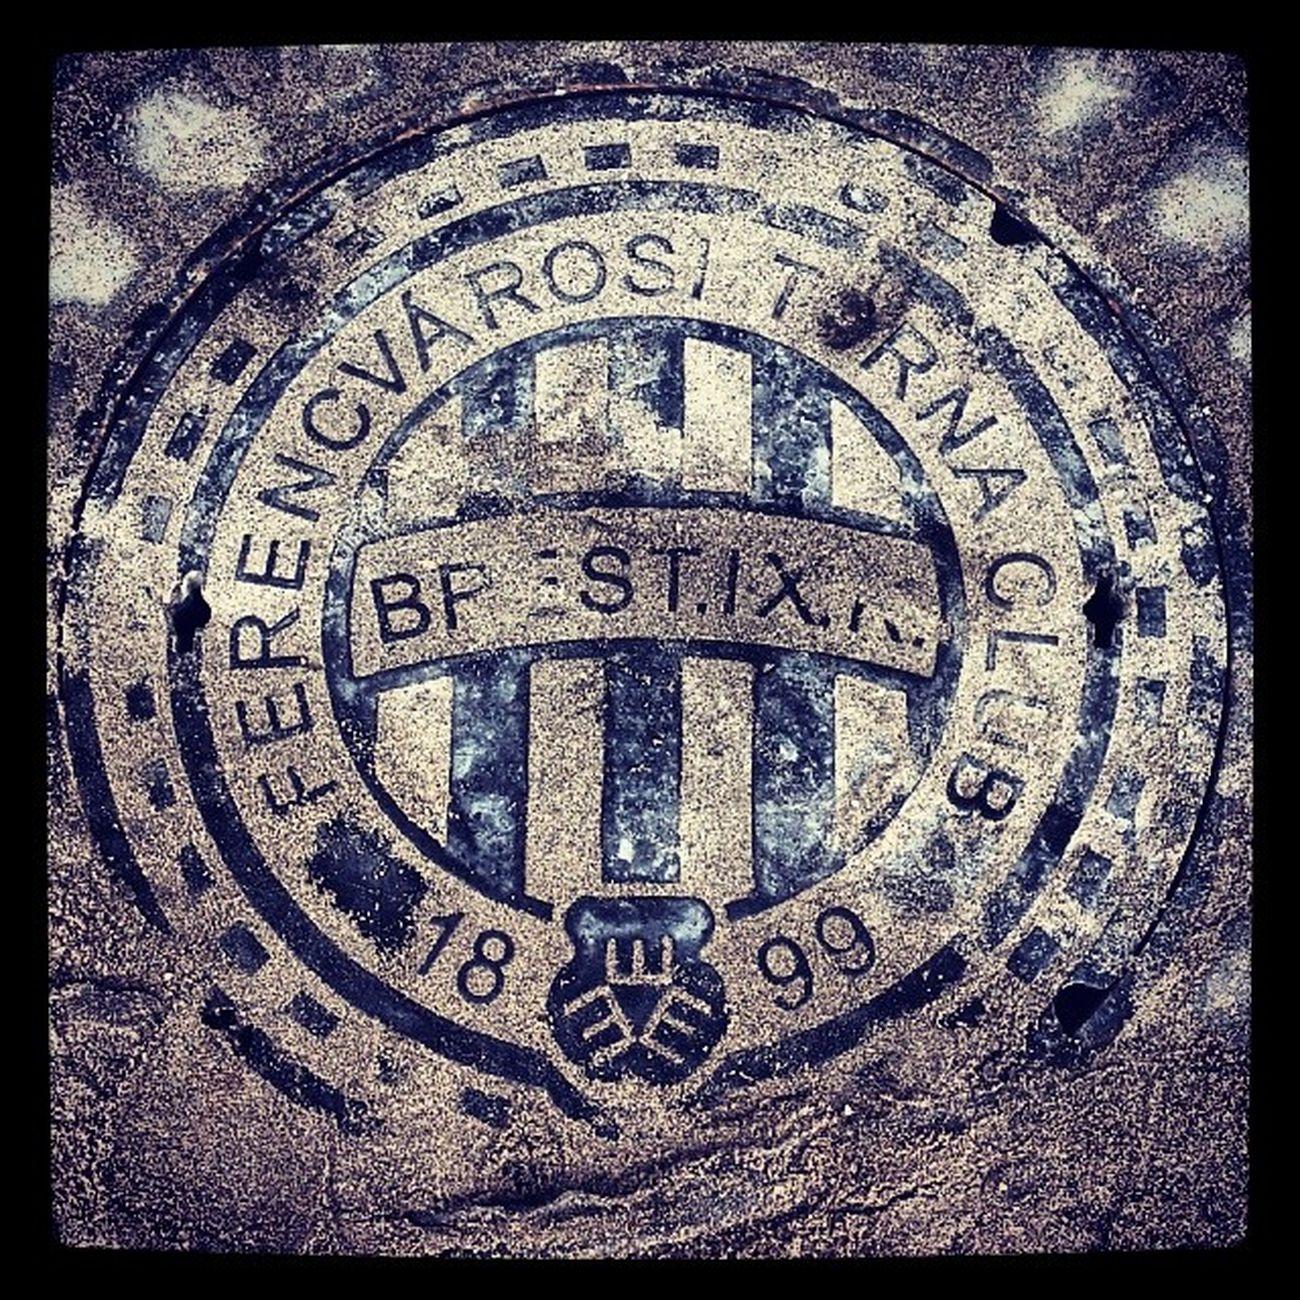 Csatornafedő az új stadionban Fradicimer FTC  Ferencváros Fradi 1899